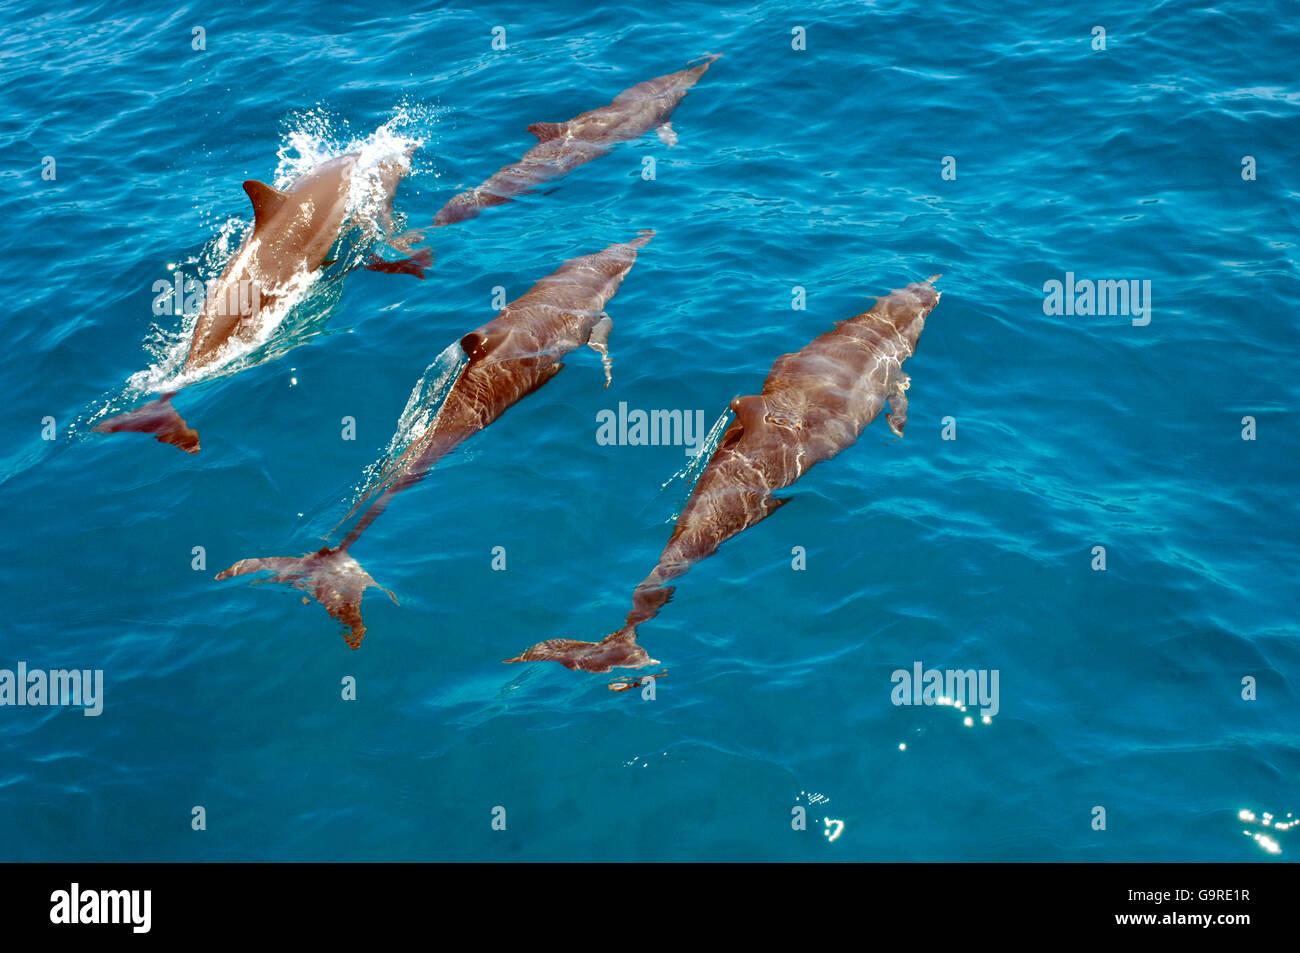 Eastern Spinner Dolphins / (Stenella longirostris) - Stock Image